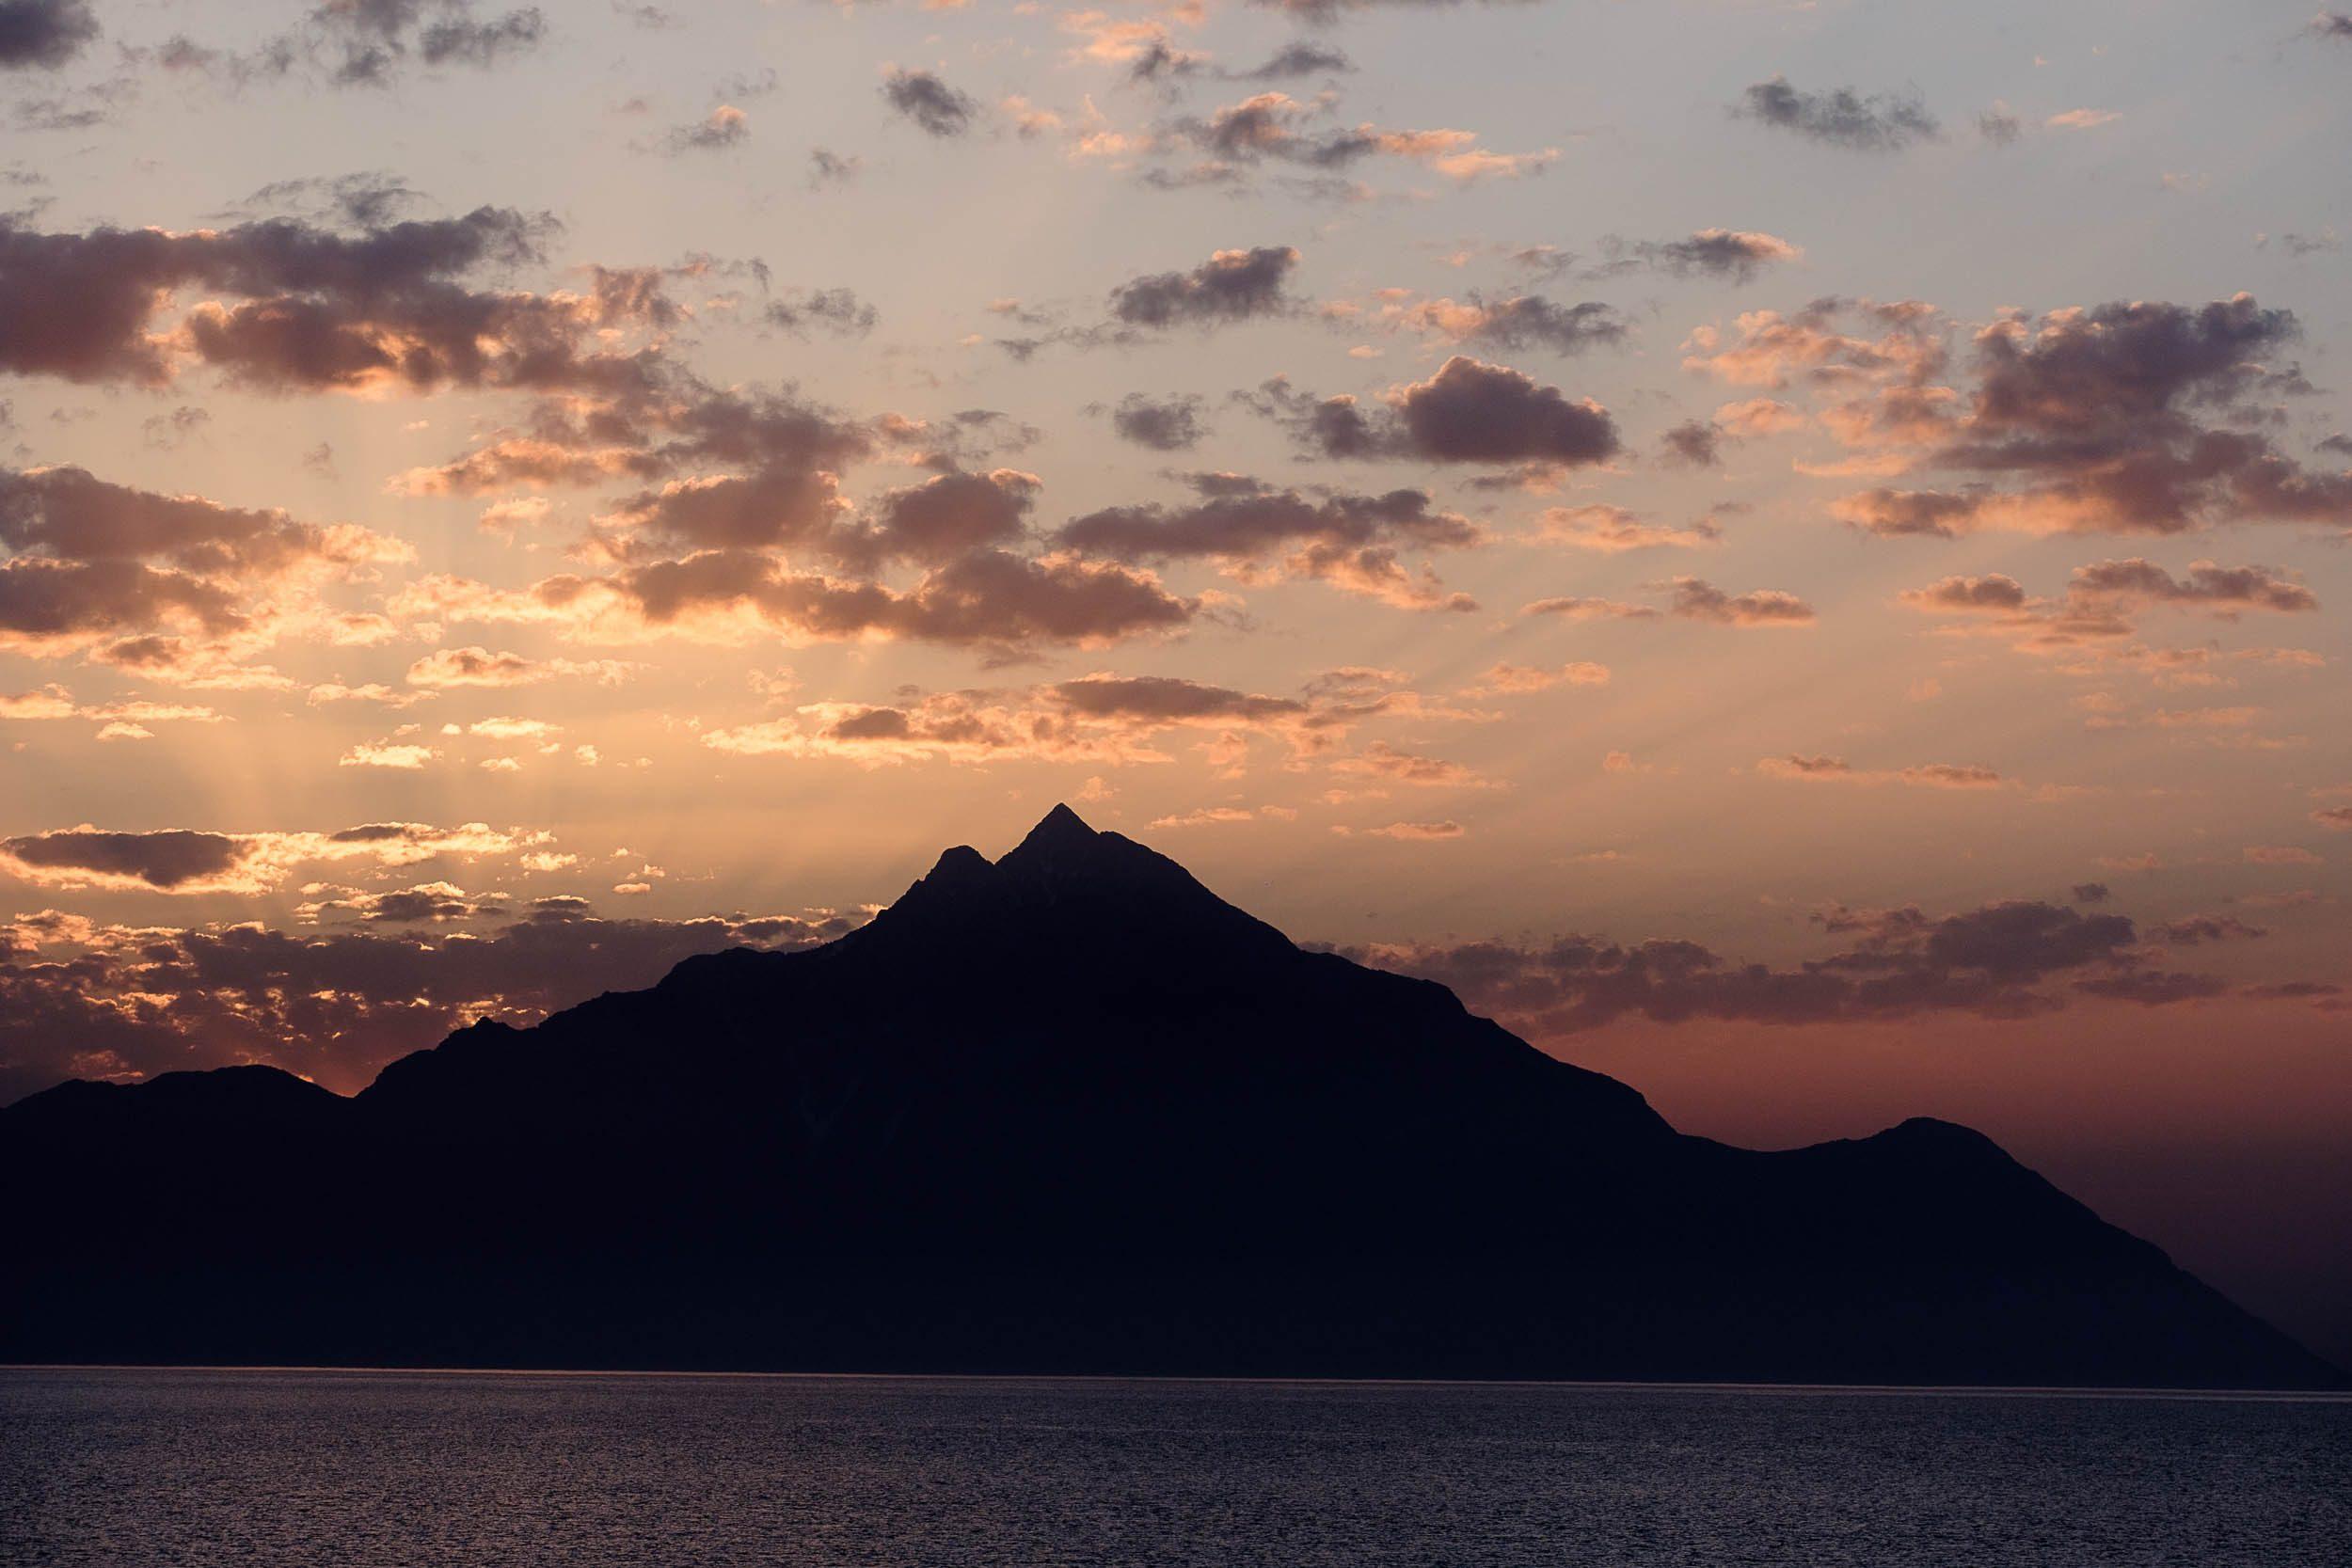 Sonnenaufgang Berg Athos Mönchsrepublik Athos, Griechenland, Ägäis